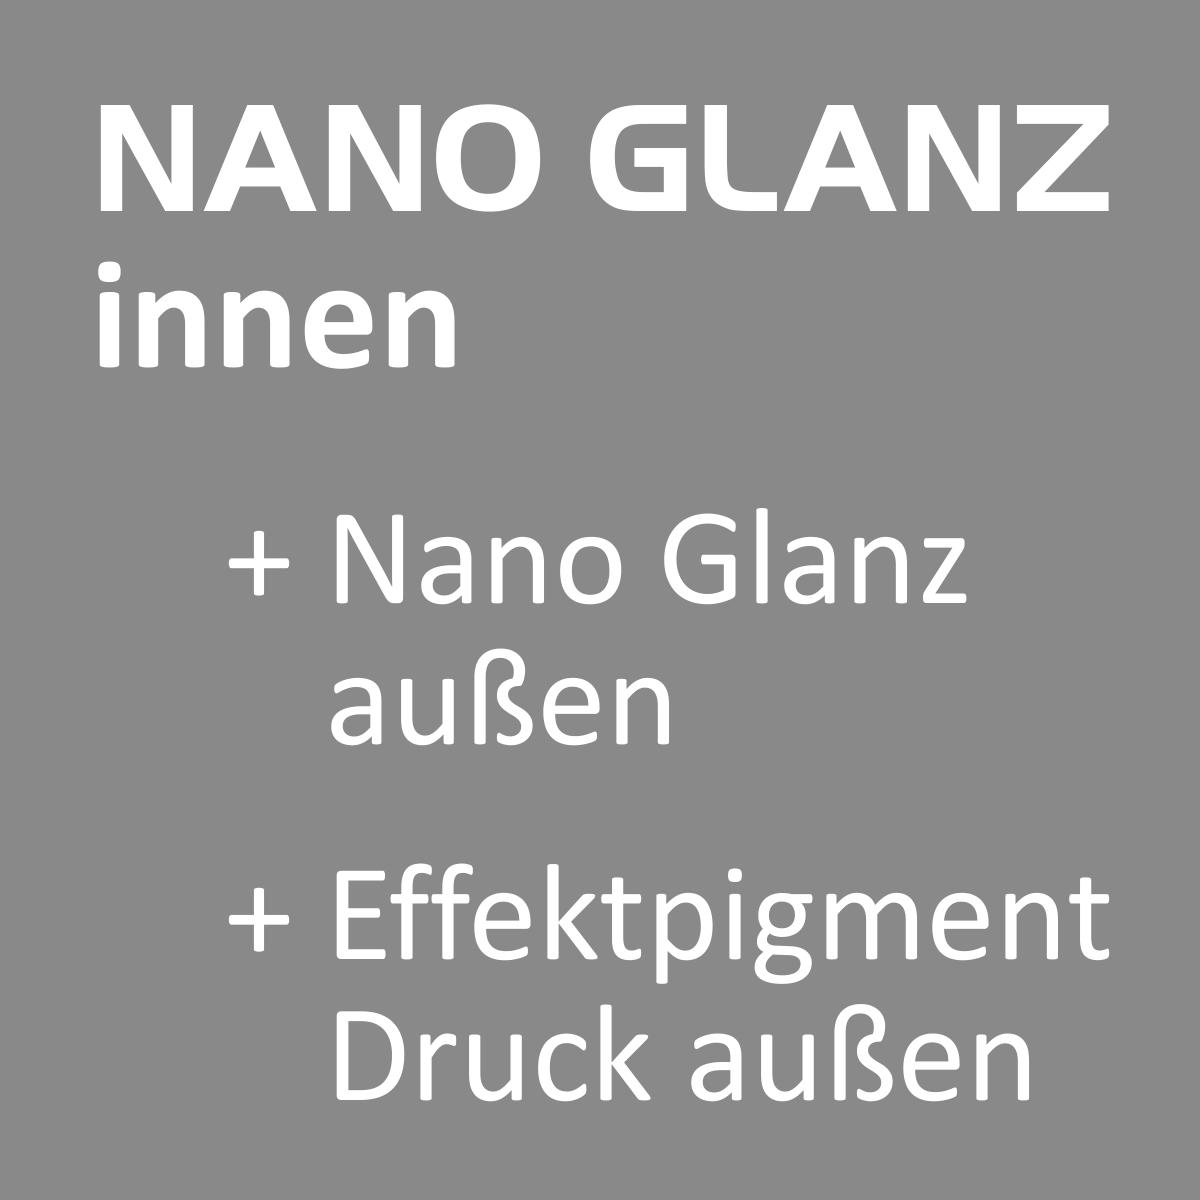 Nano Glanz_9 Text